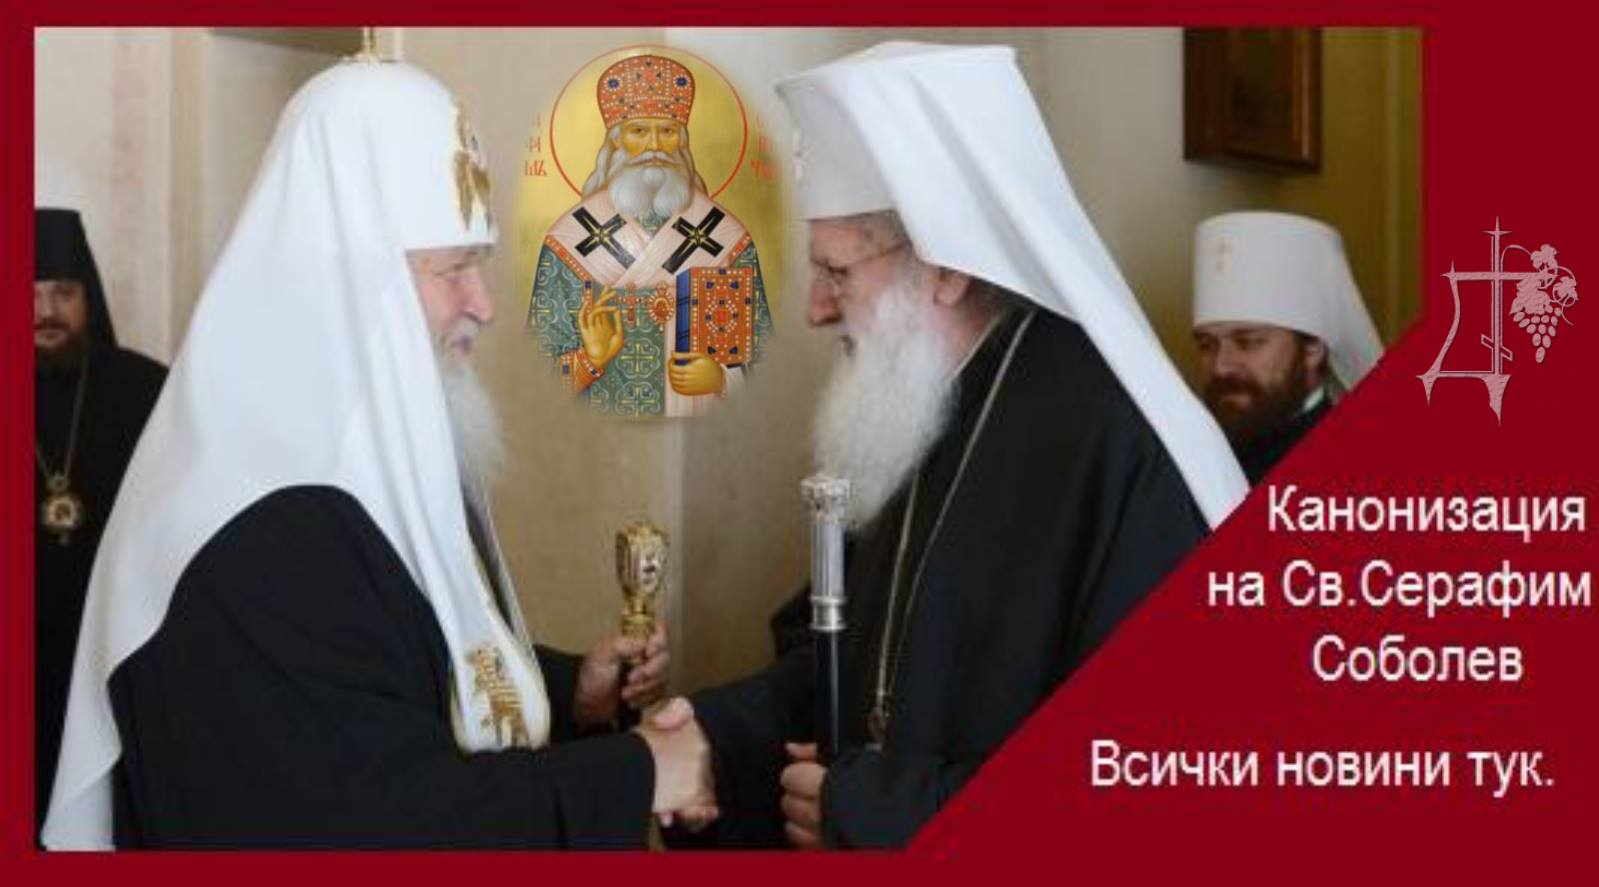 Канонизация на Св. Серафим Соболев